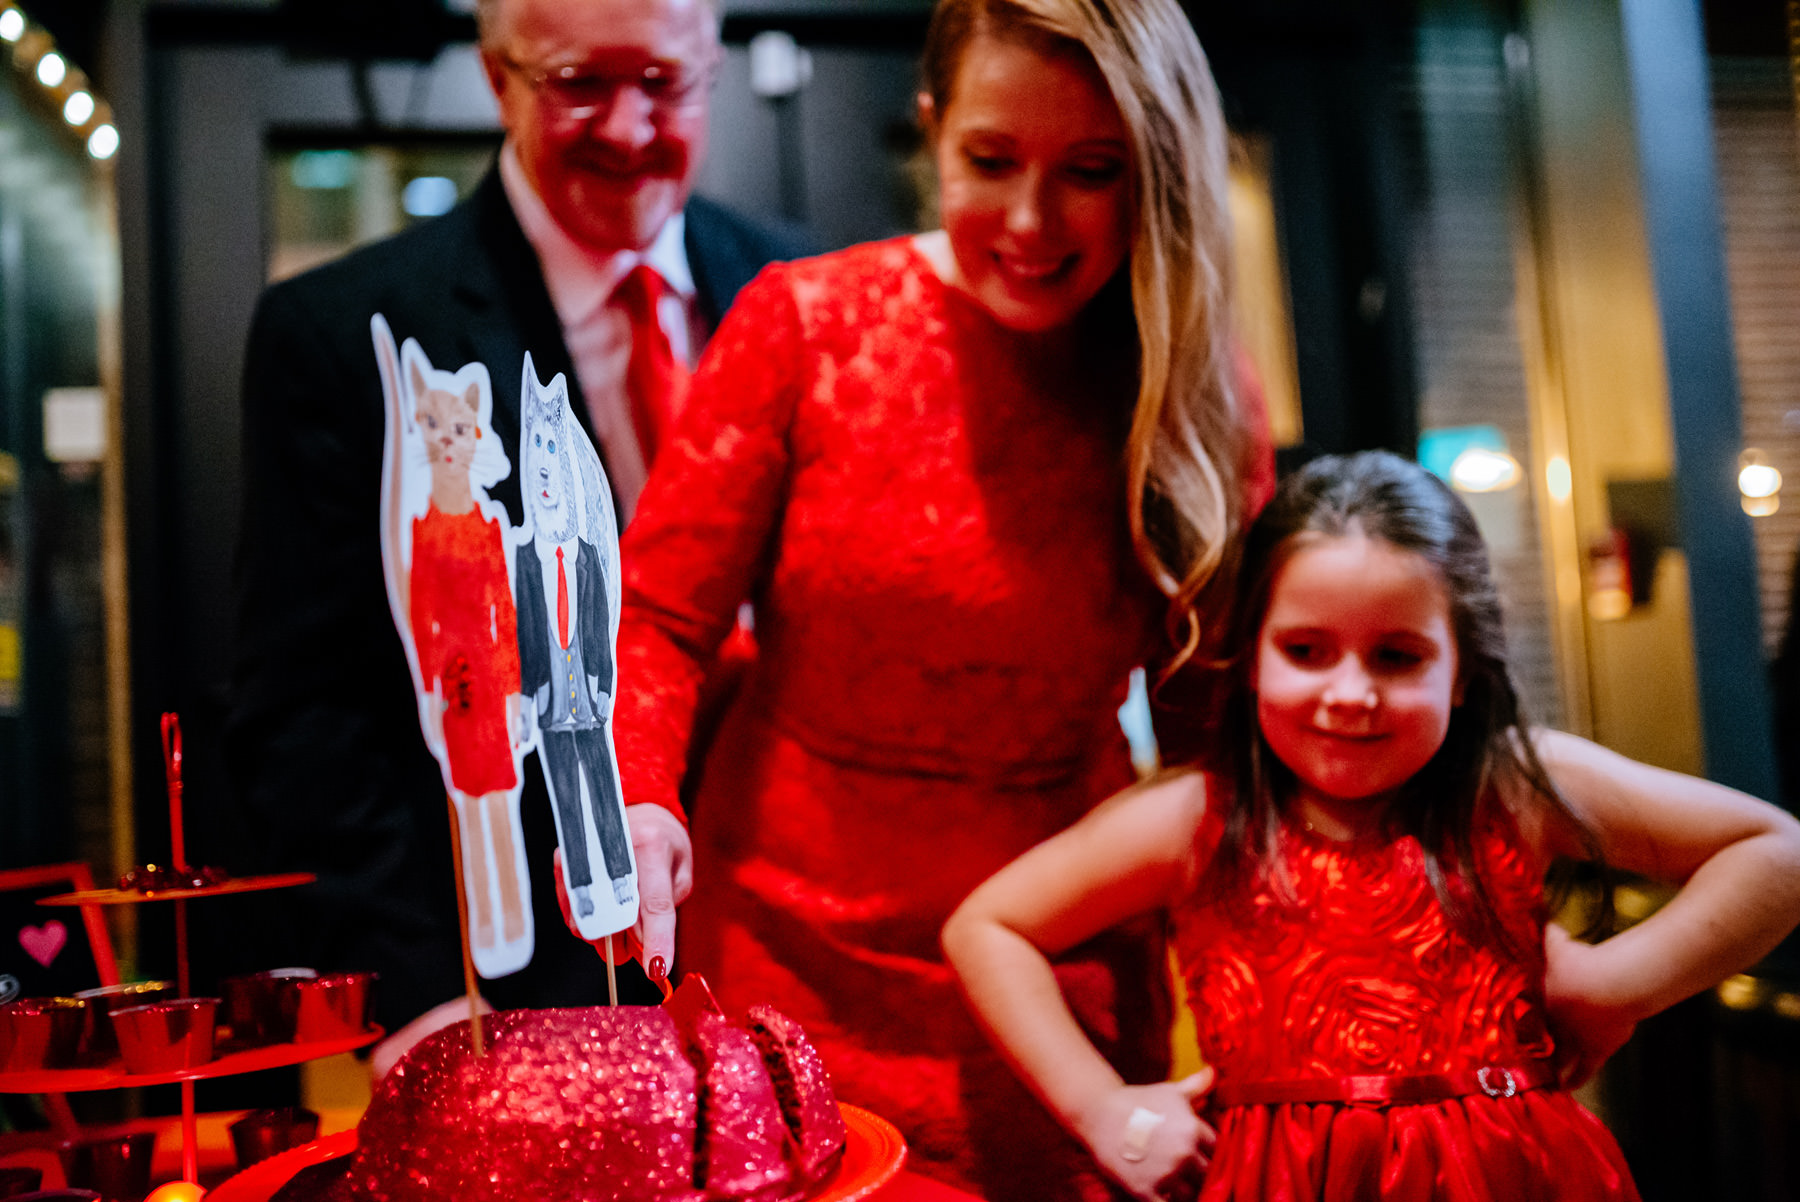 flowergirl inspects wedding cake